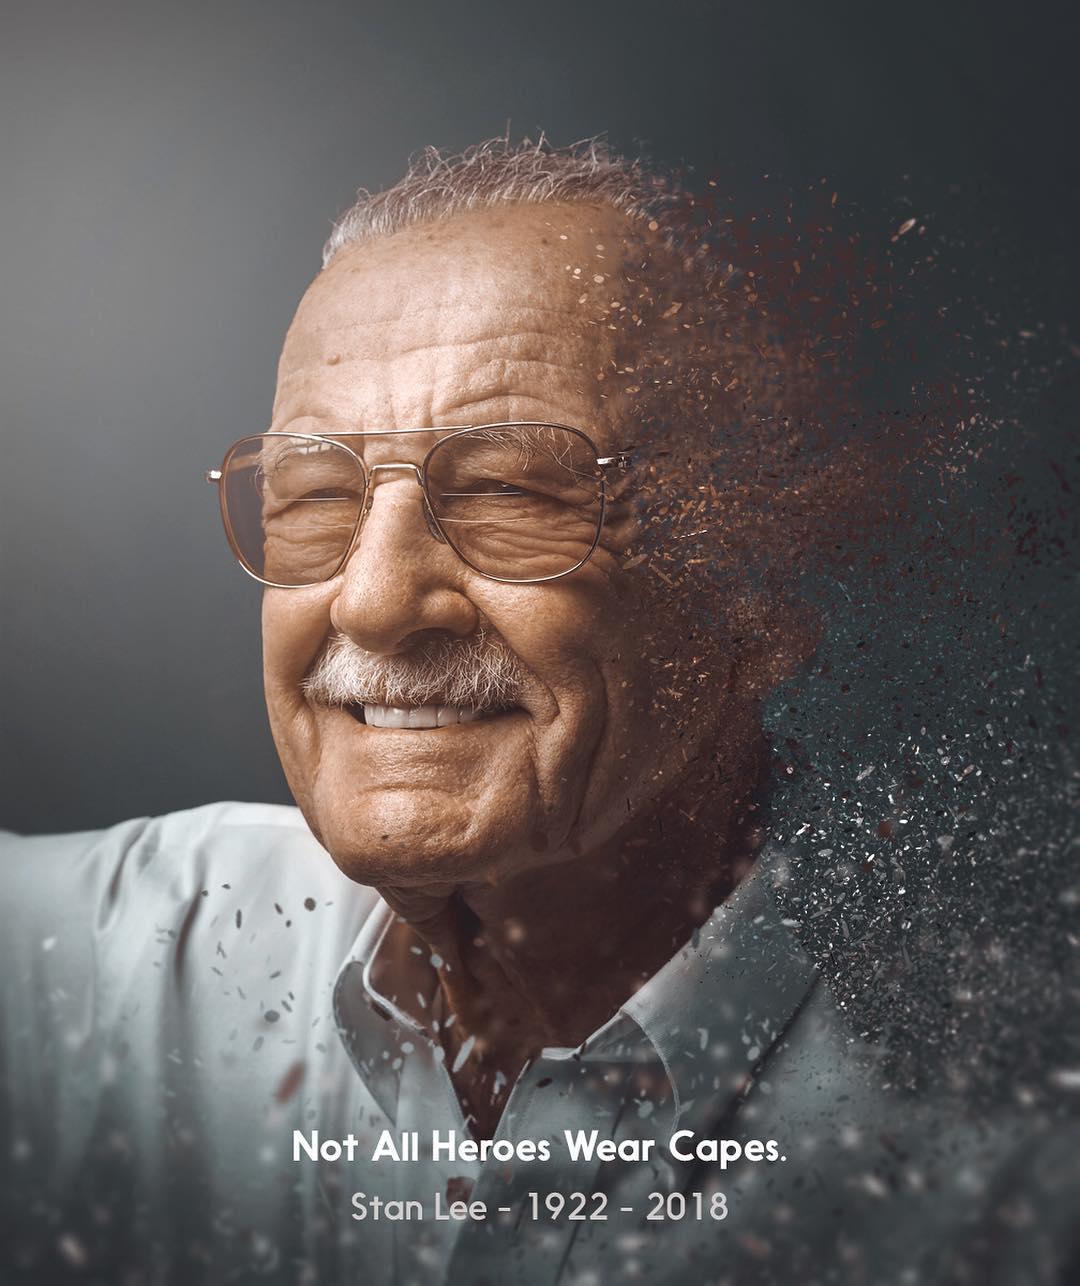 Stan Lee - Not All Heroes Wear Capes by Shaun Ryken